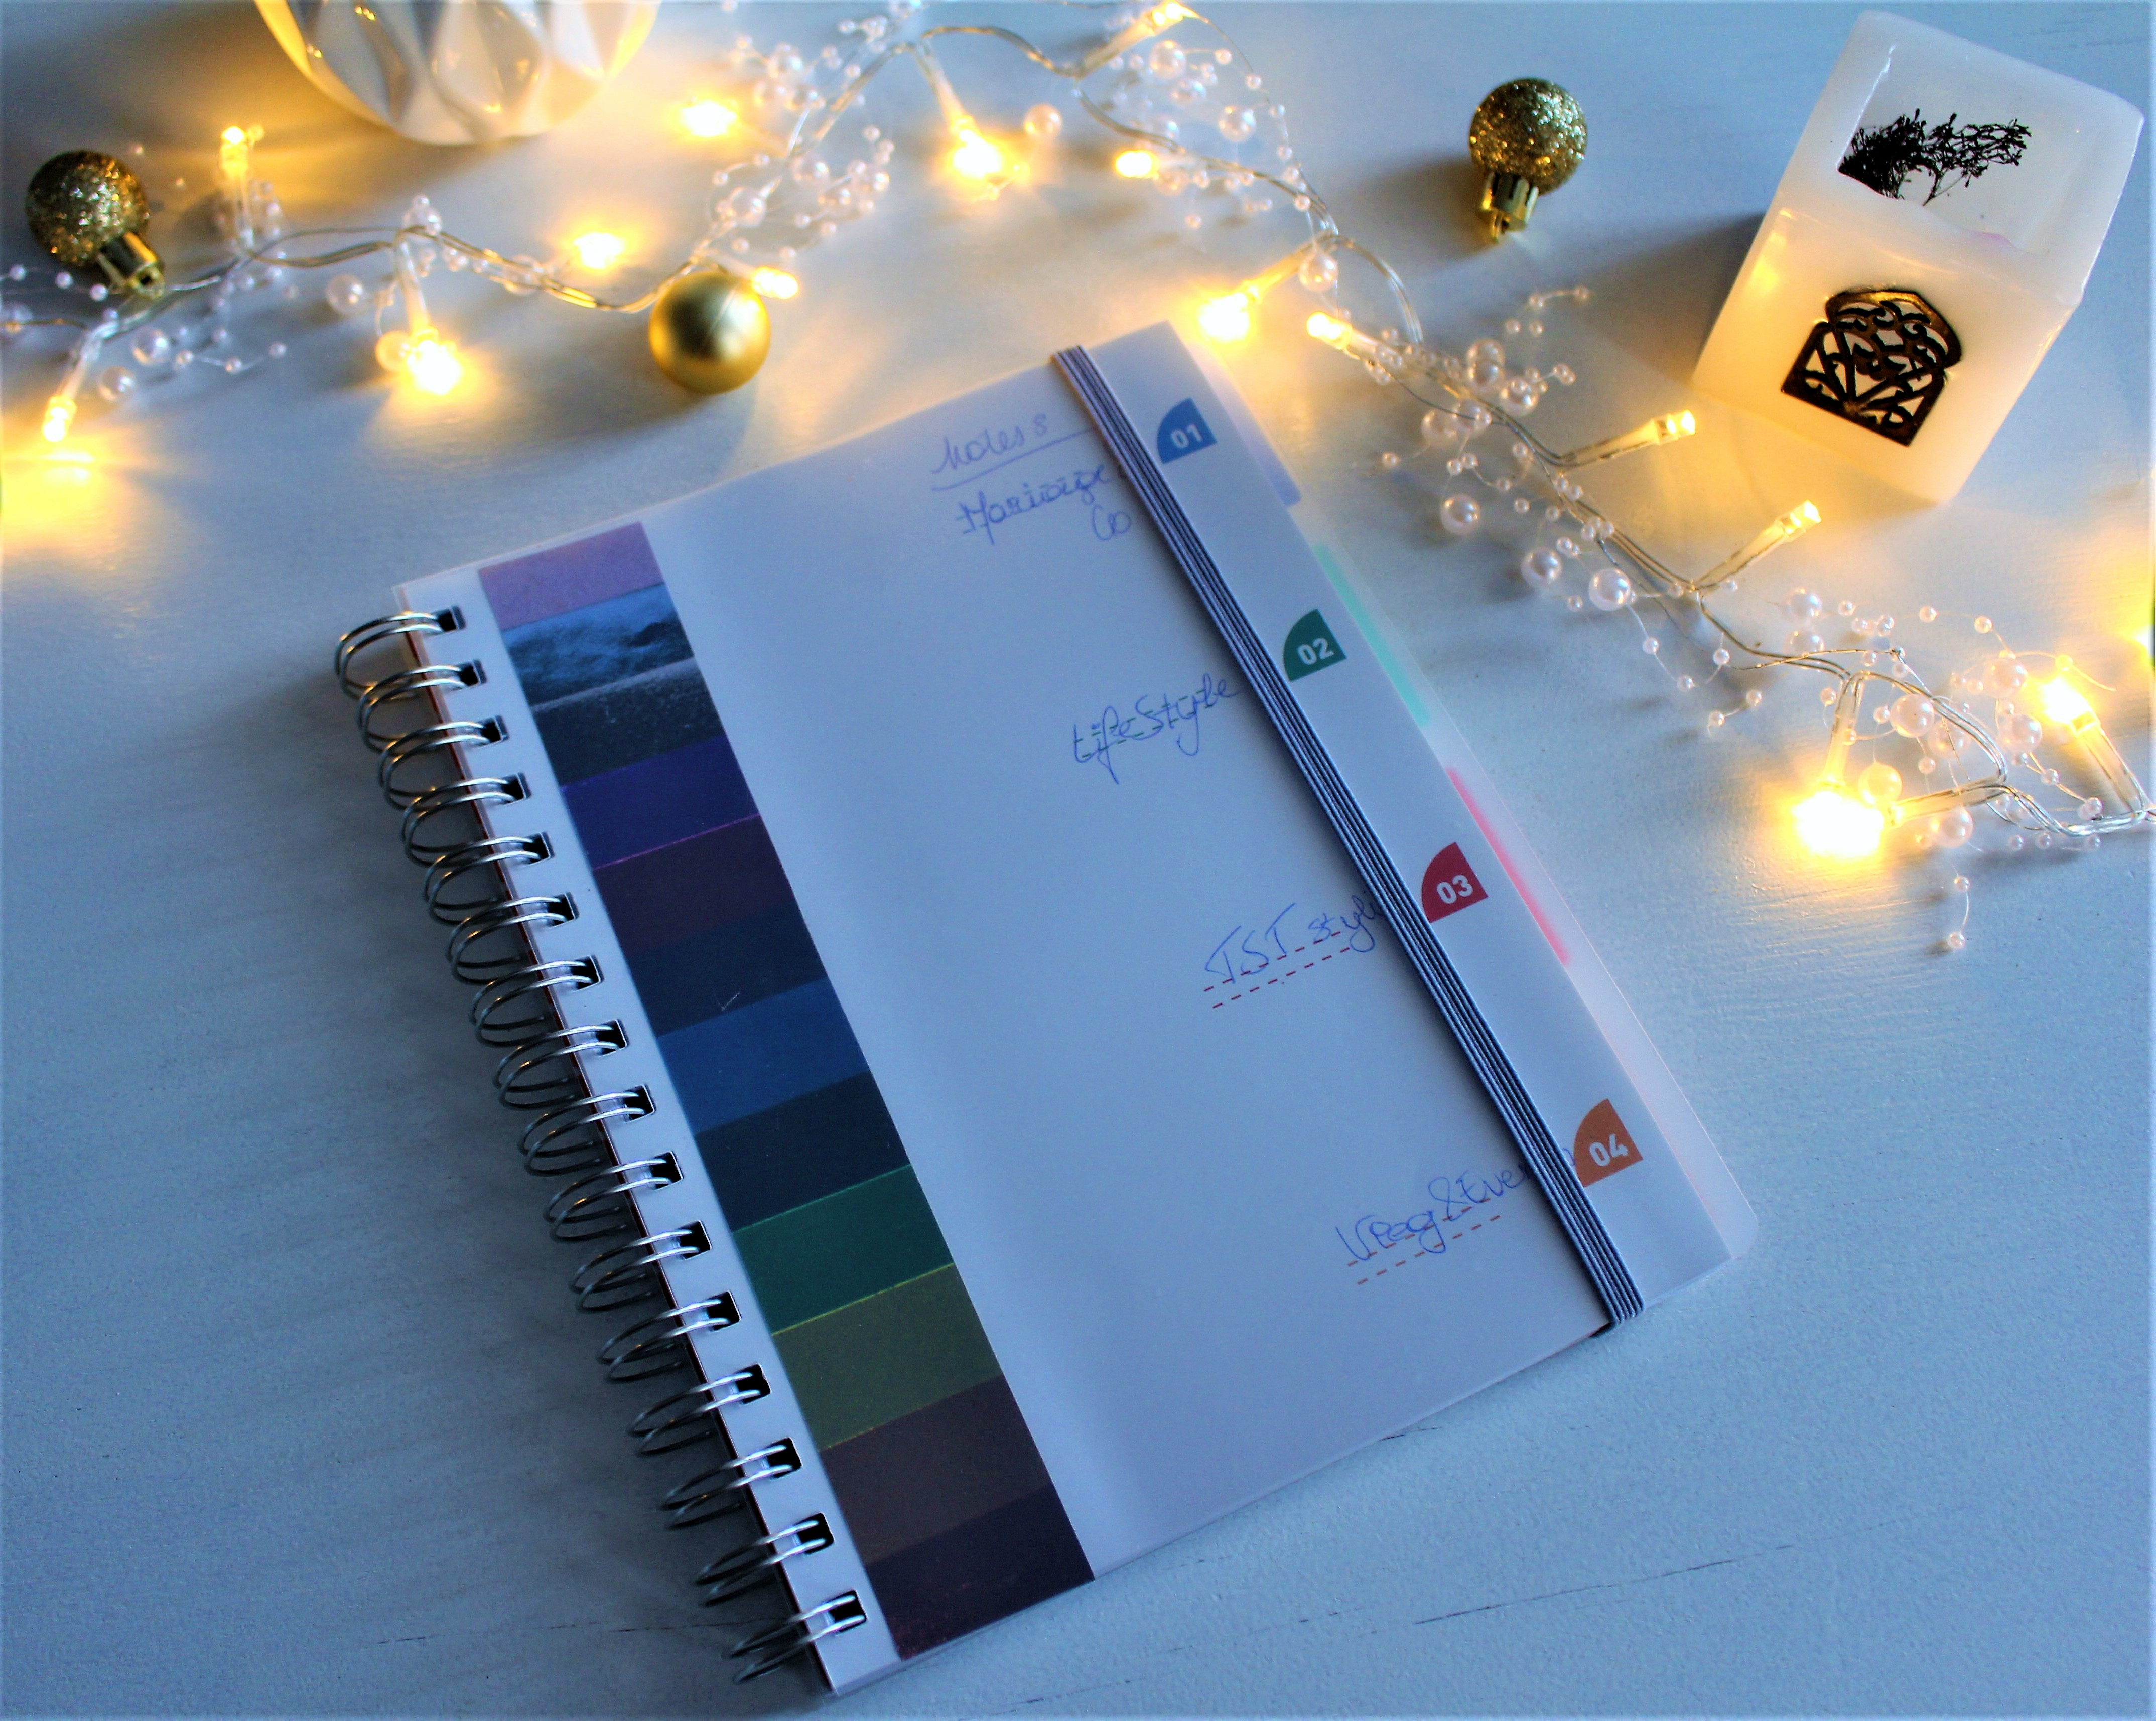 organiser sa passion blogging - stylish atelier